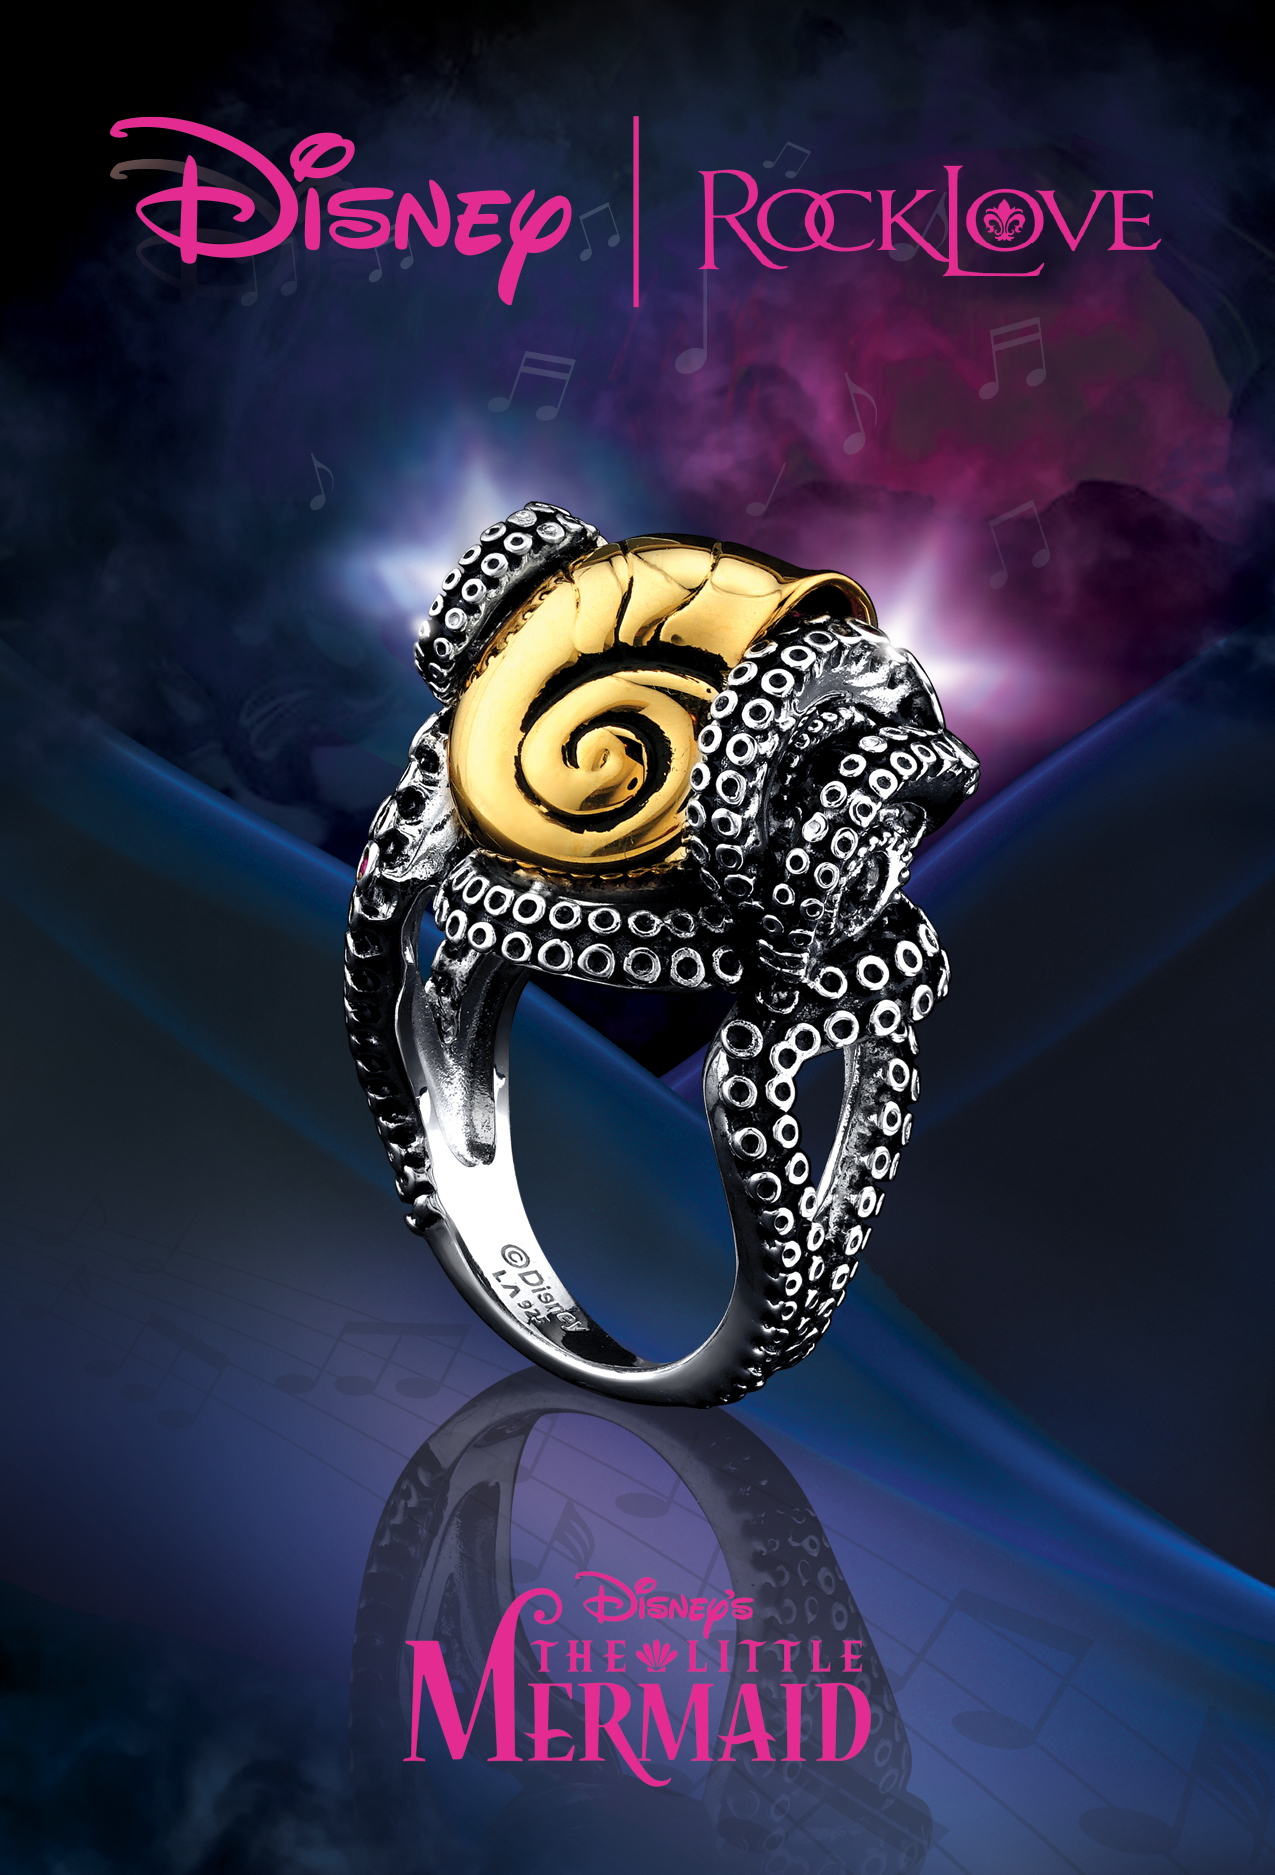 disney, the little mermaid, beautiful, jewelry, ring, jewelry ad, blue, print ad. creative jewelry ad